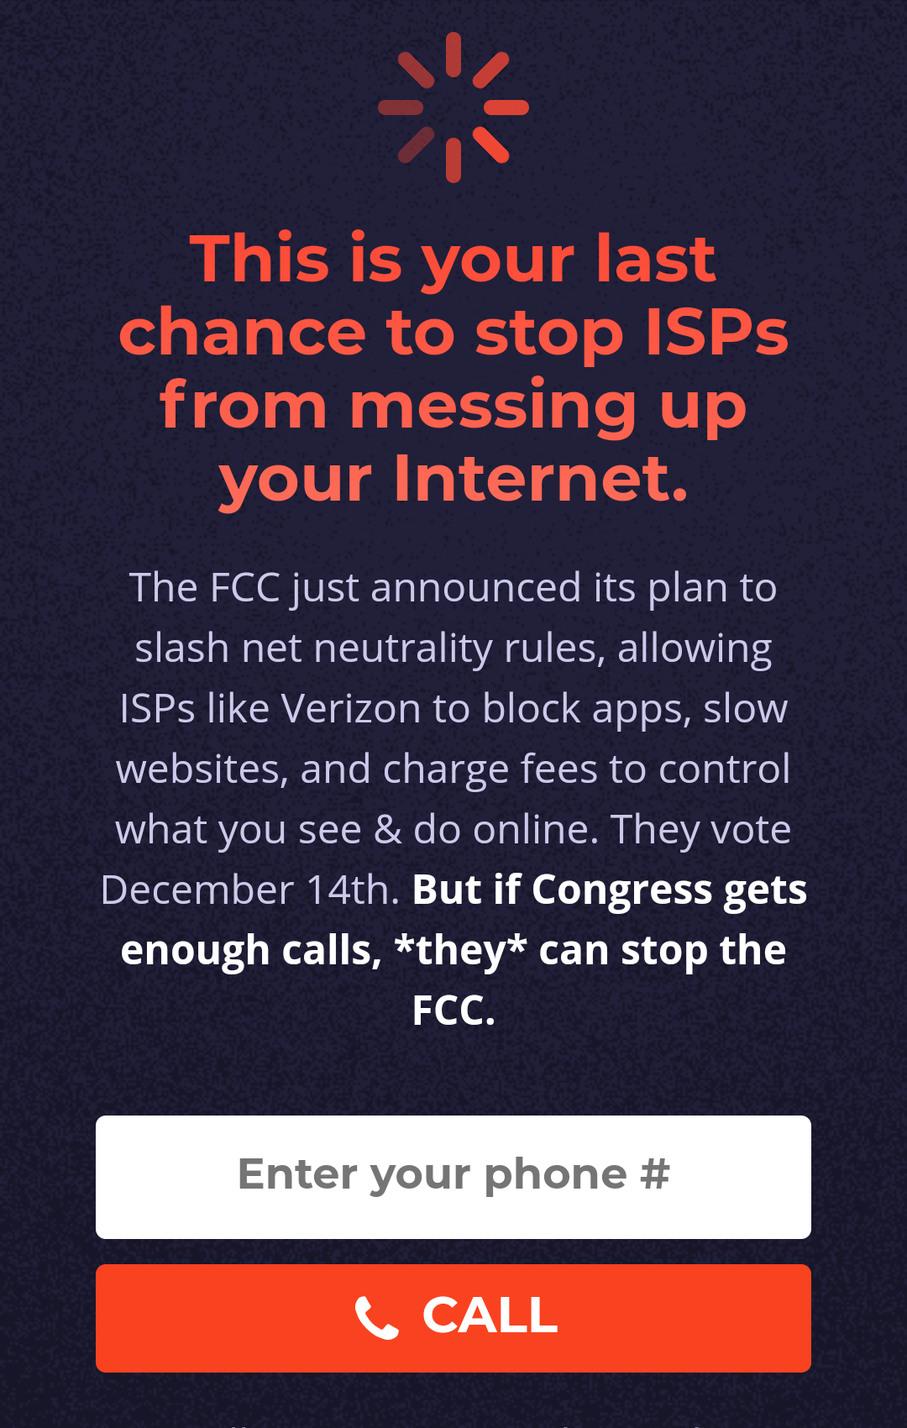 Not a meme, but Americans, please visit battleforthenet.com. Please don't overlook the importance of net neutrality!